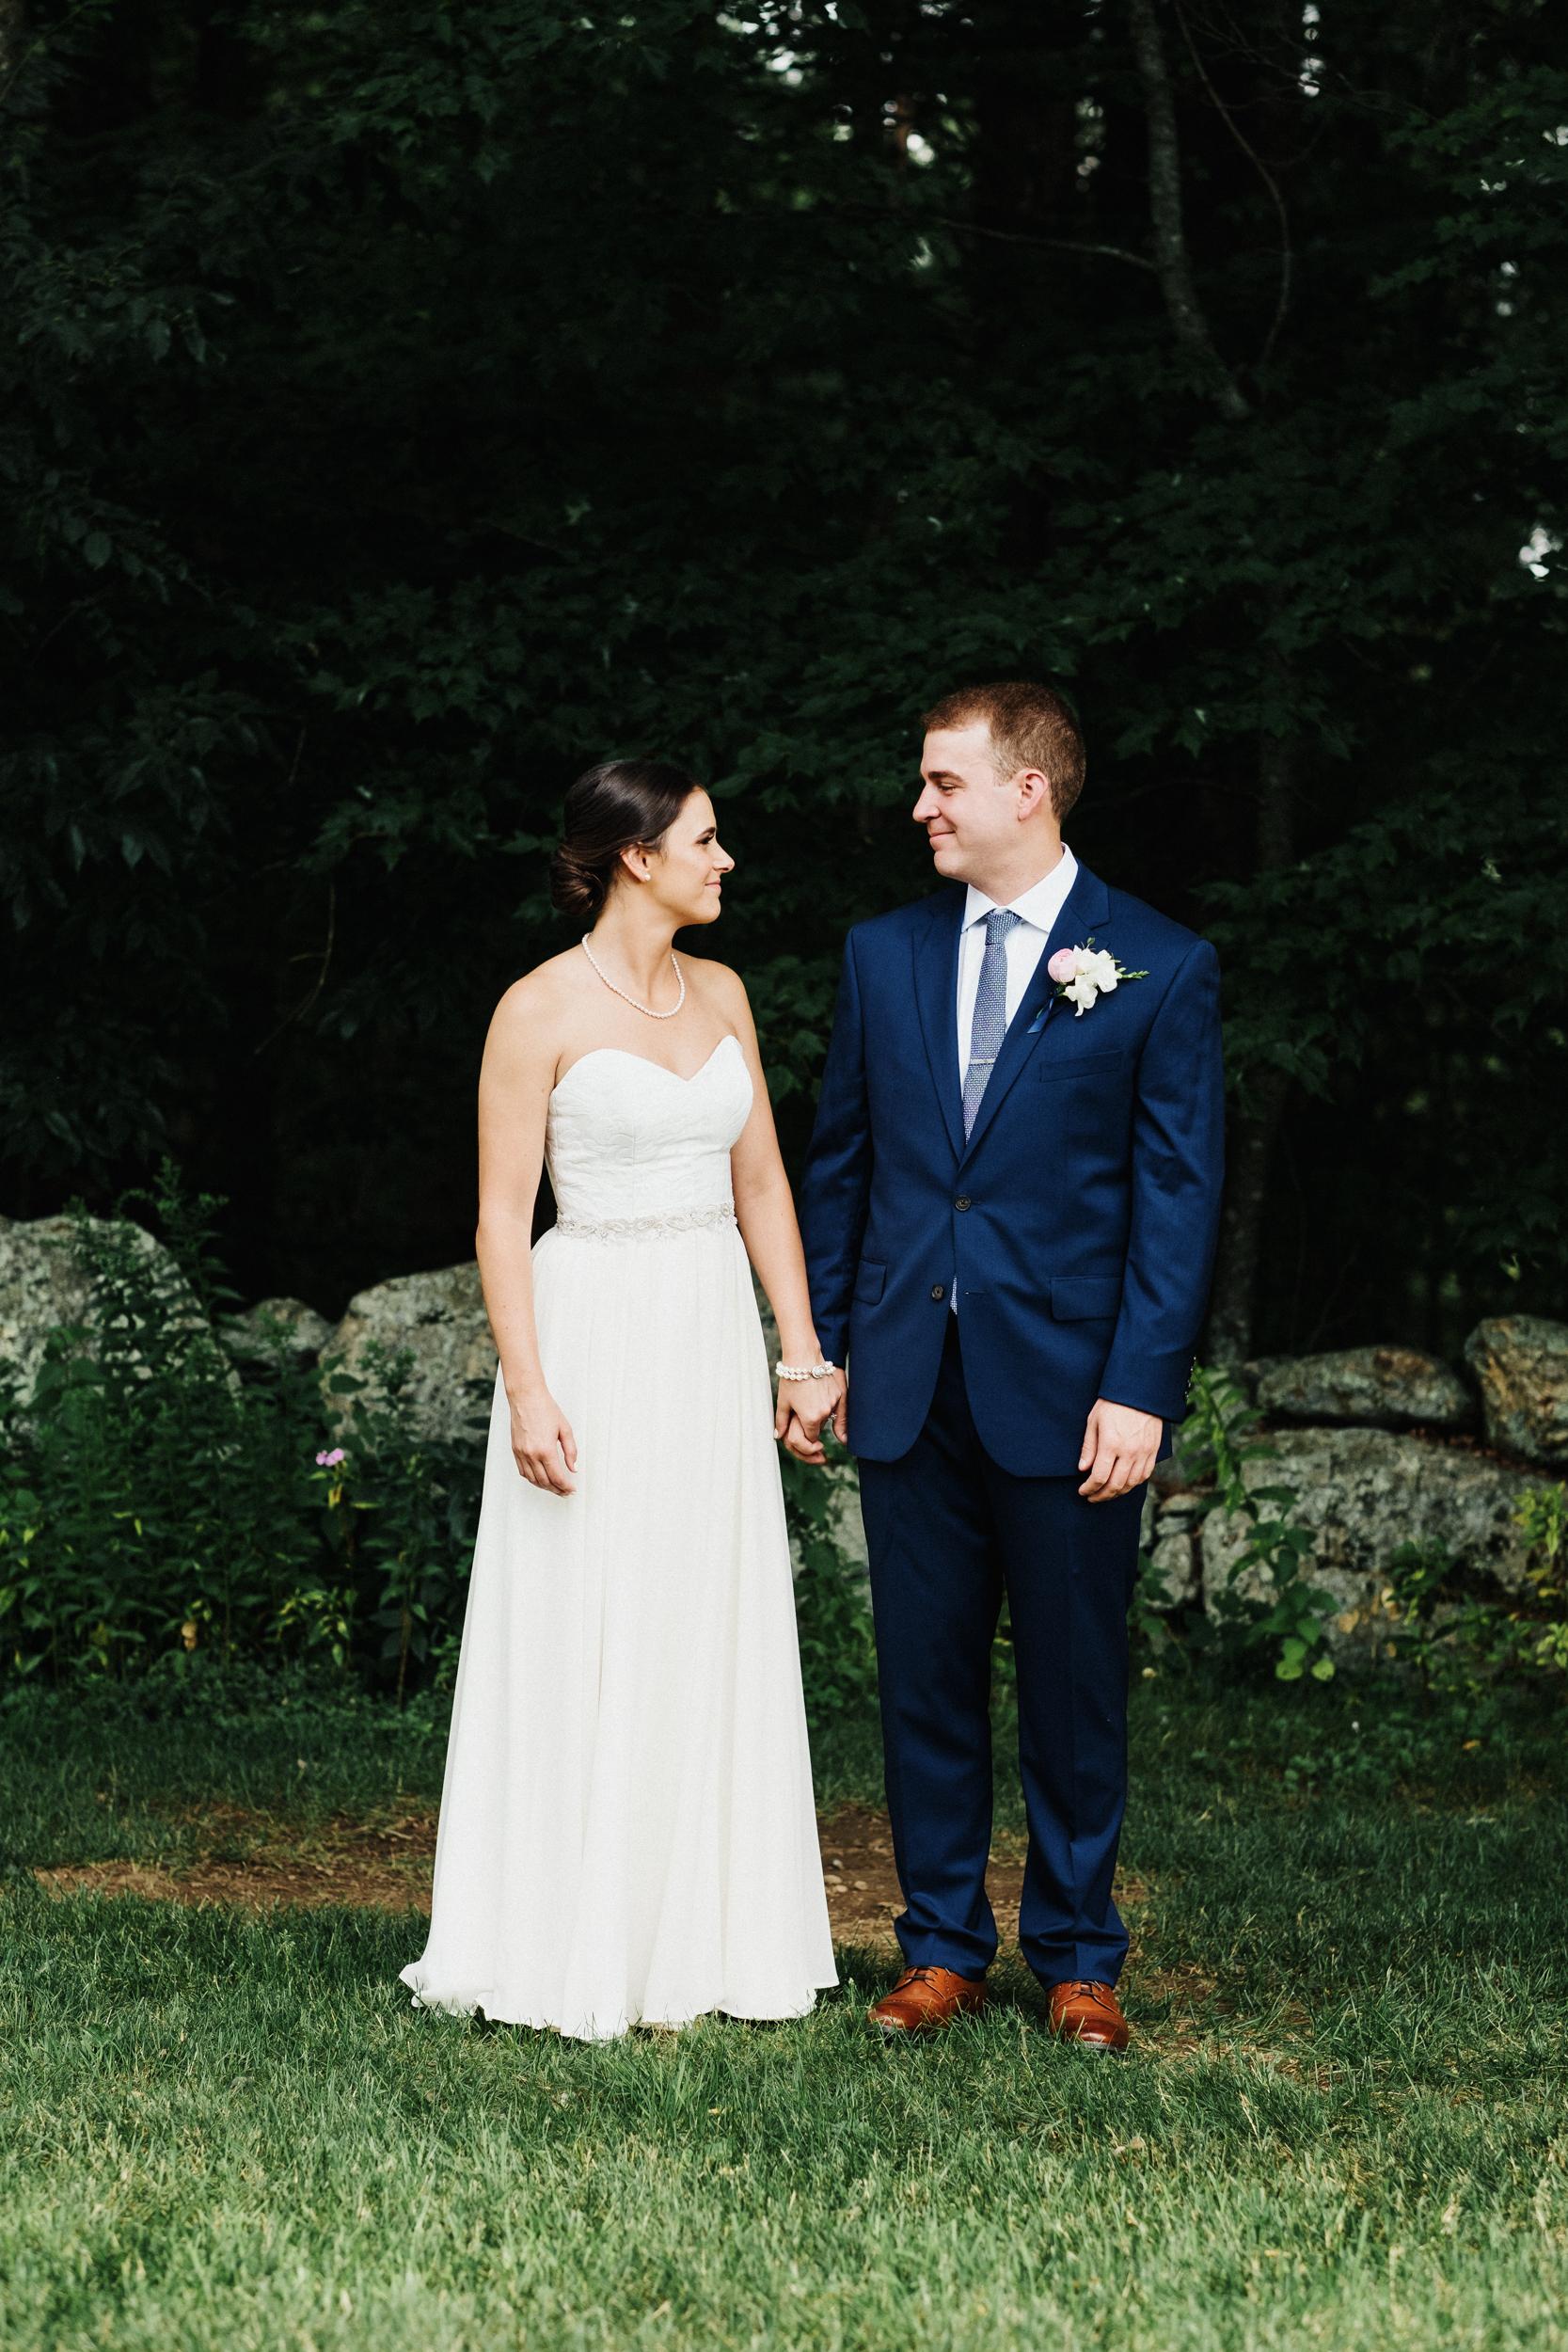 Wedding_Francis_Boucher_zukas_farm_2018-29.jpg